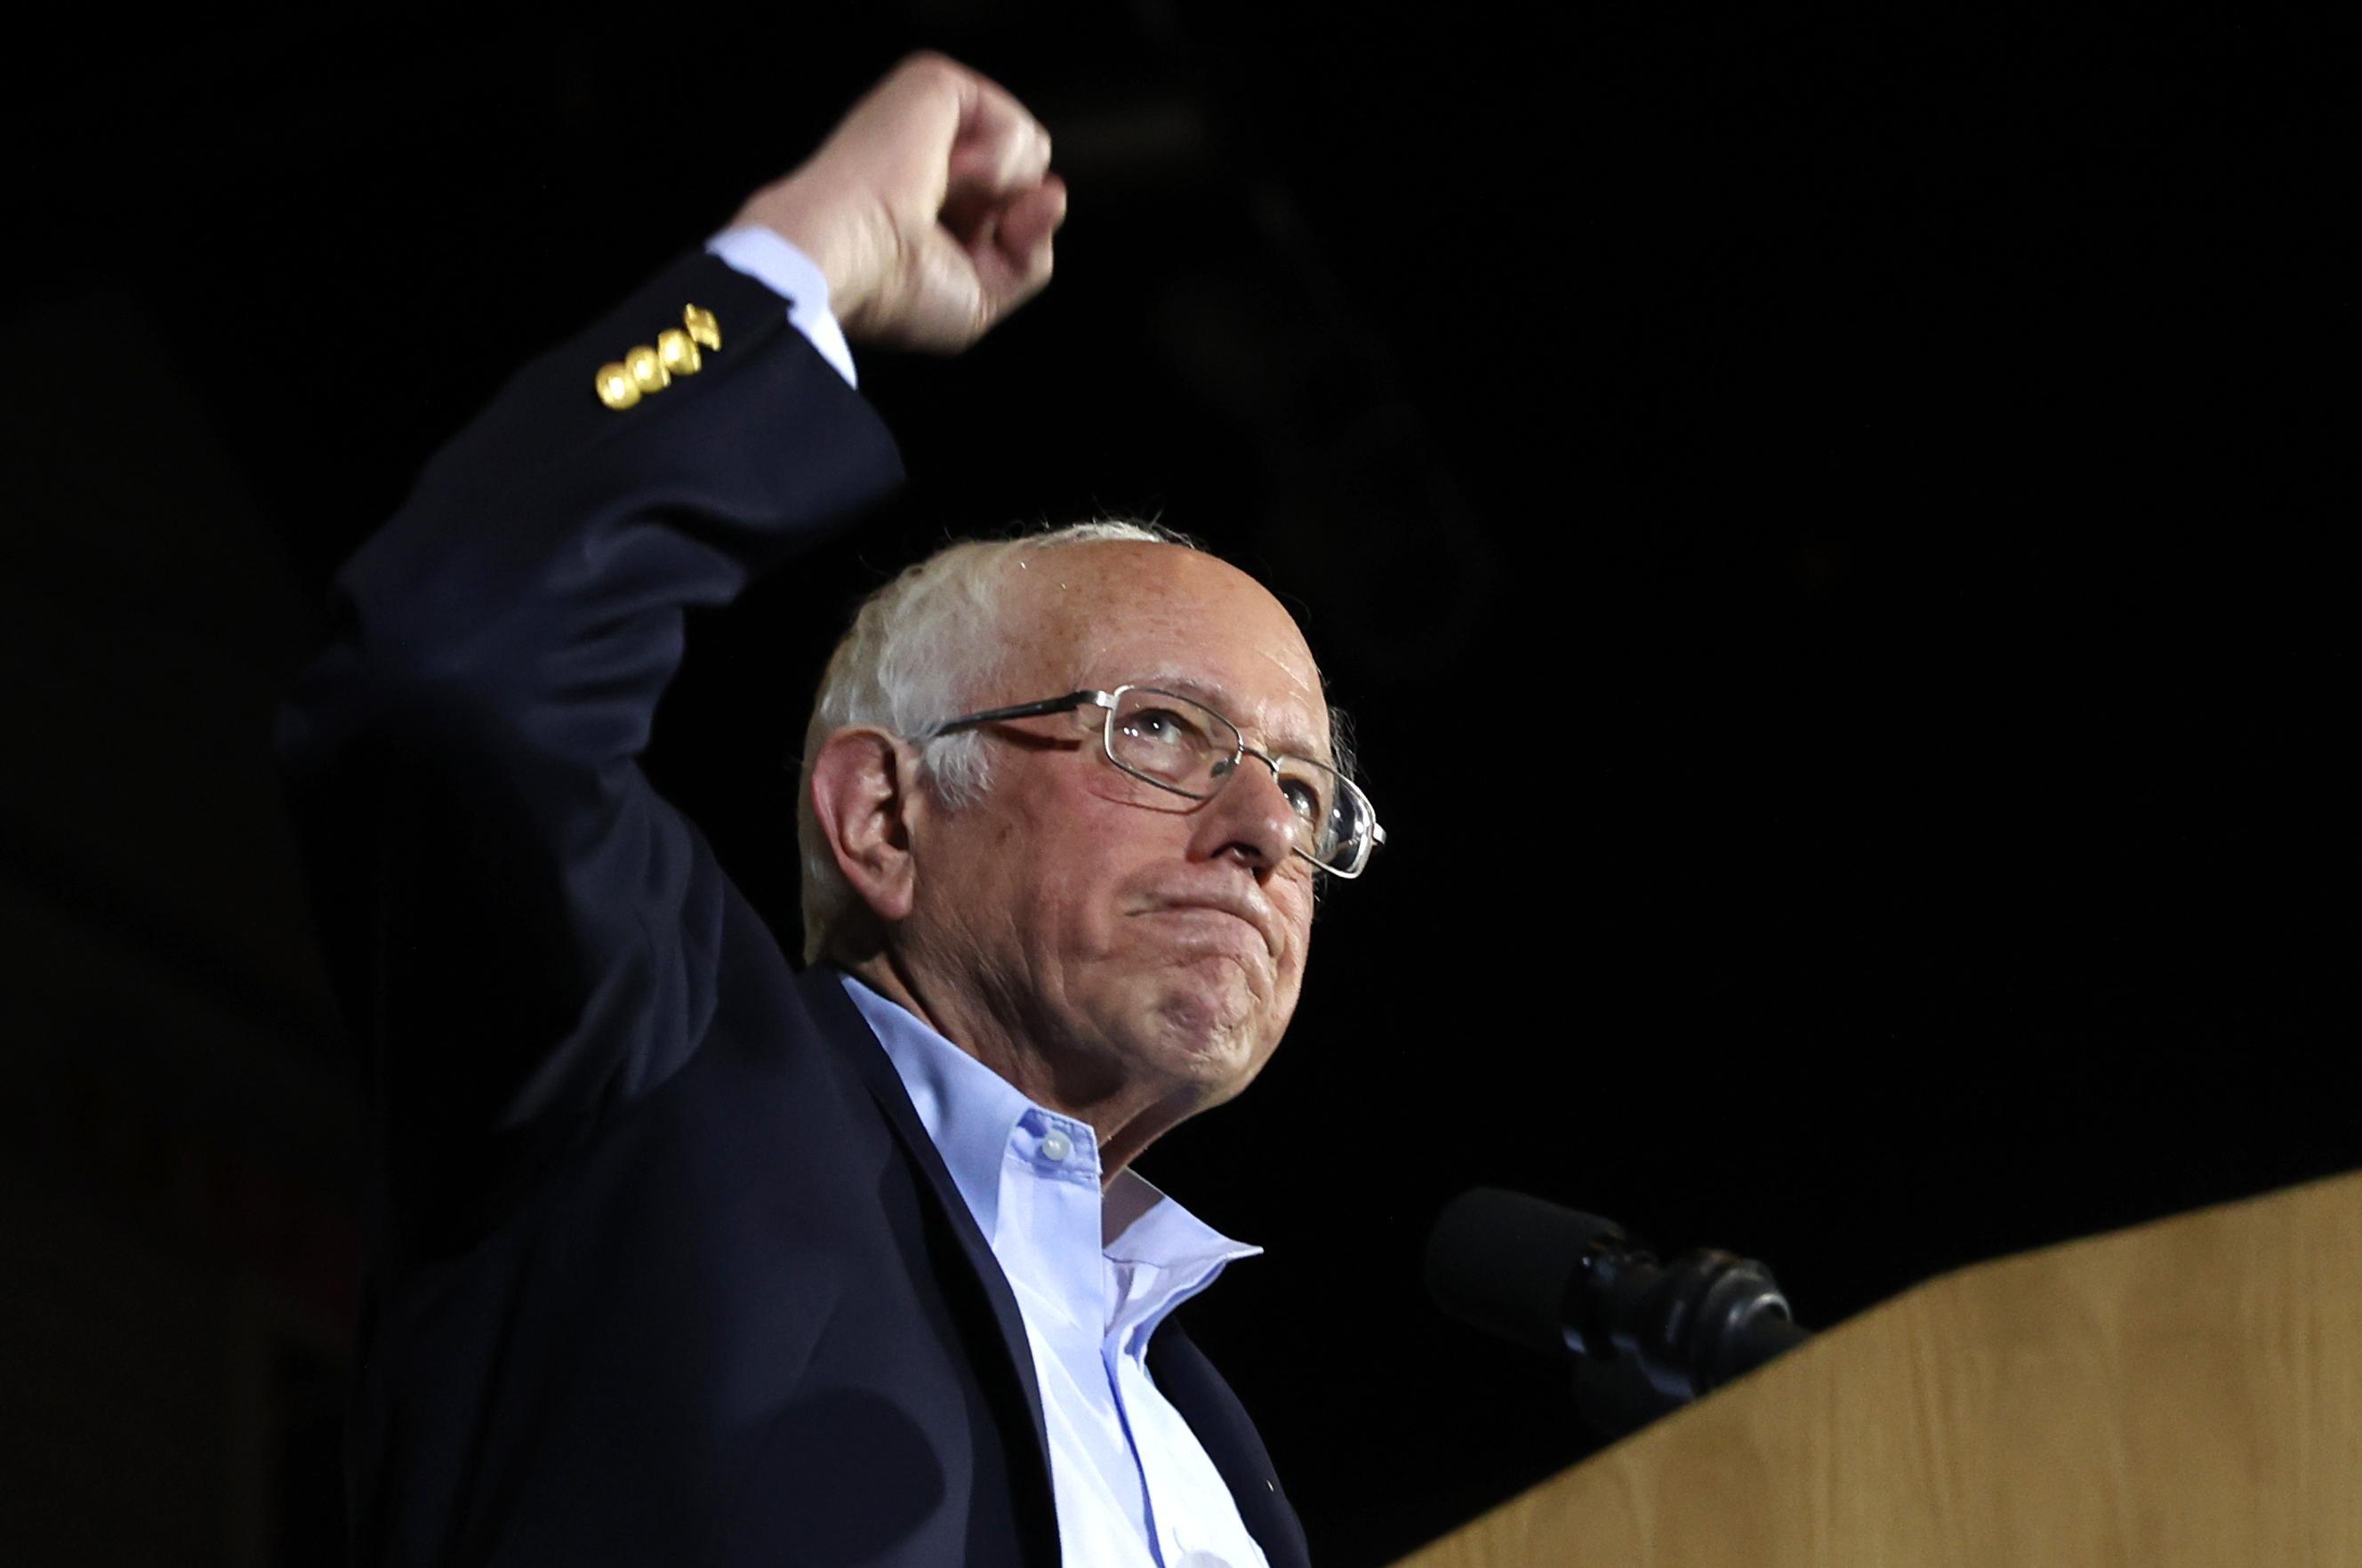 Sanders' big Nevada win narrows rivals' path to Democratic nomination